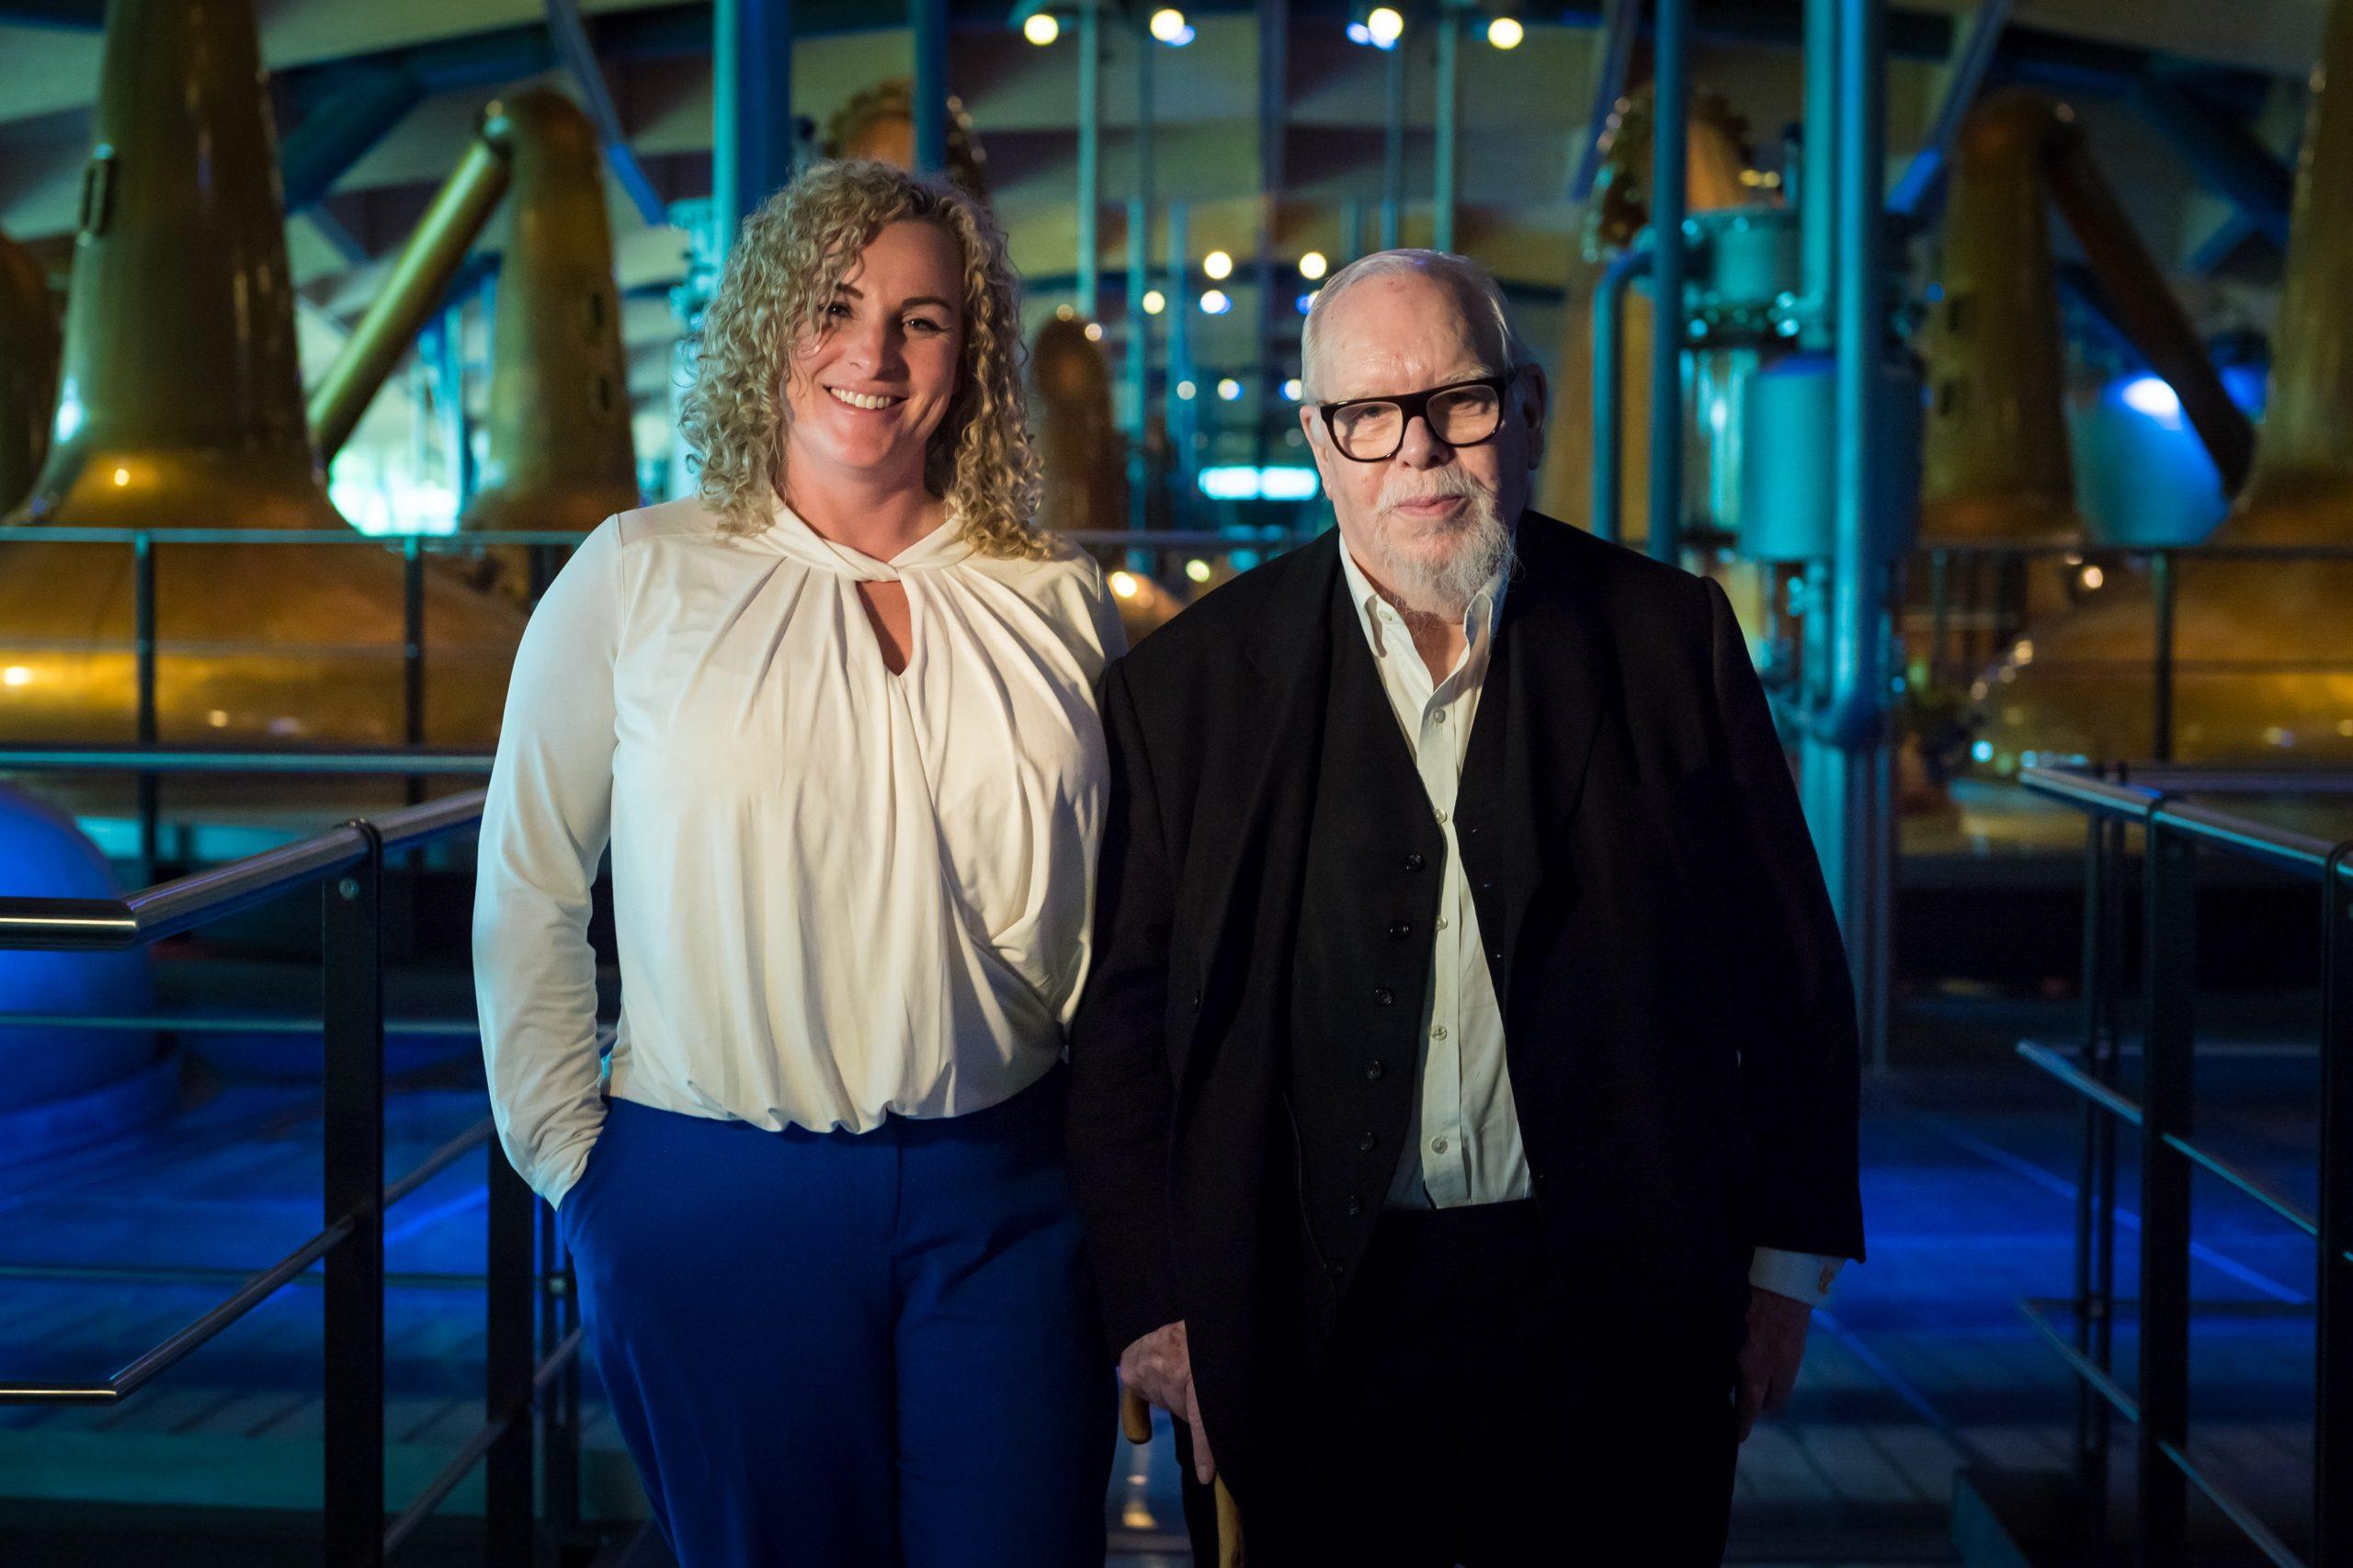 Sir Peter Blake And Sarah Burgess 1 Scaled